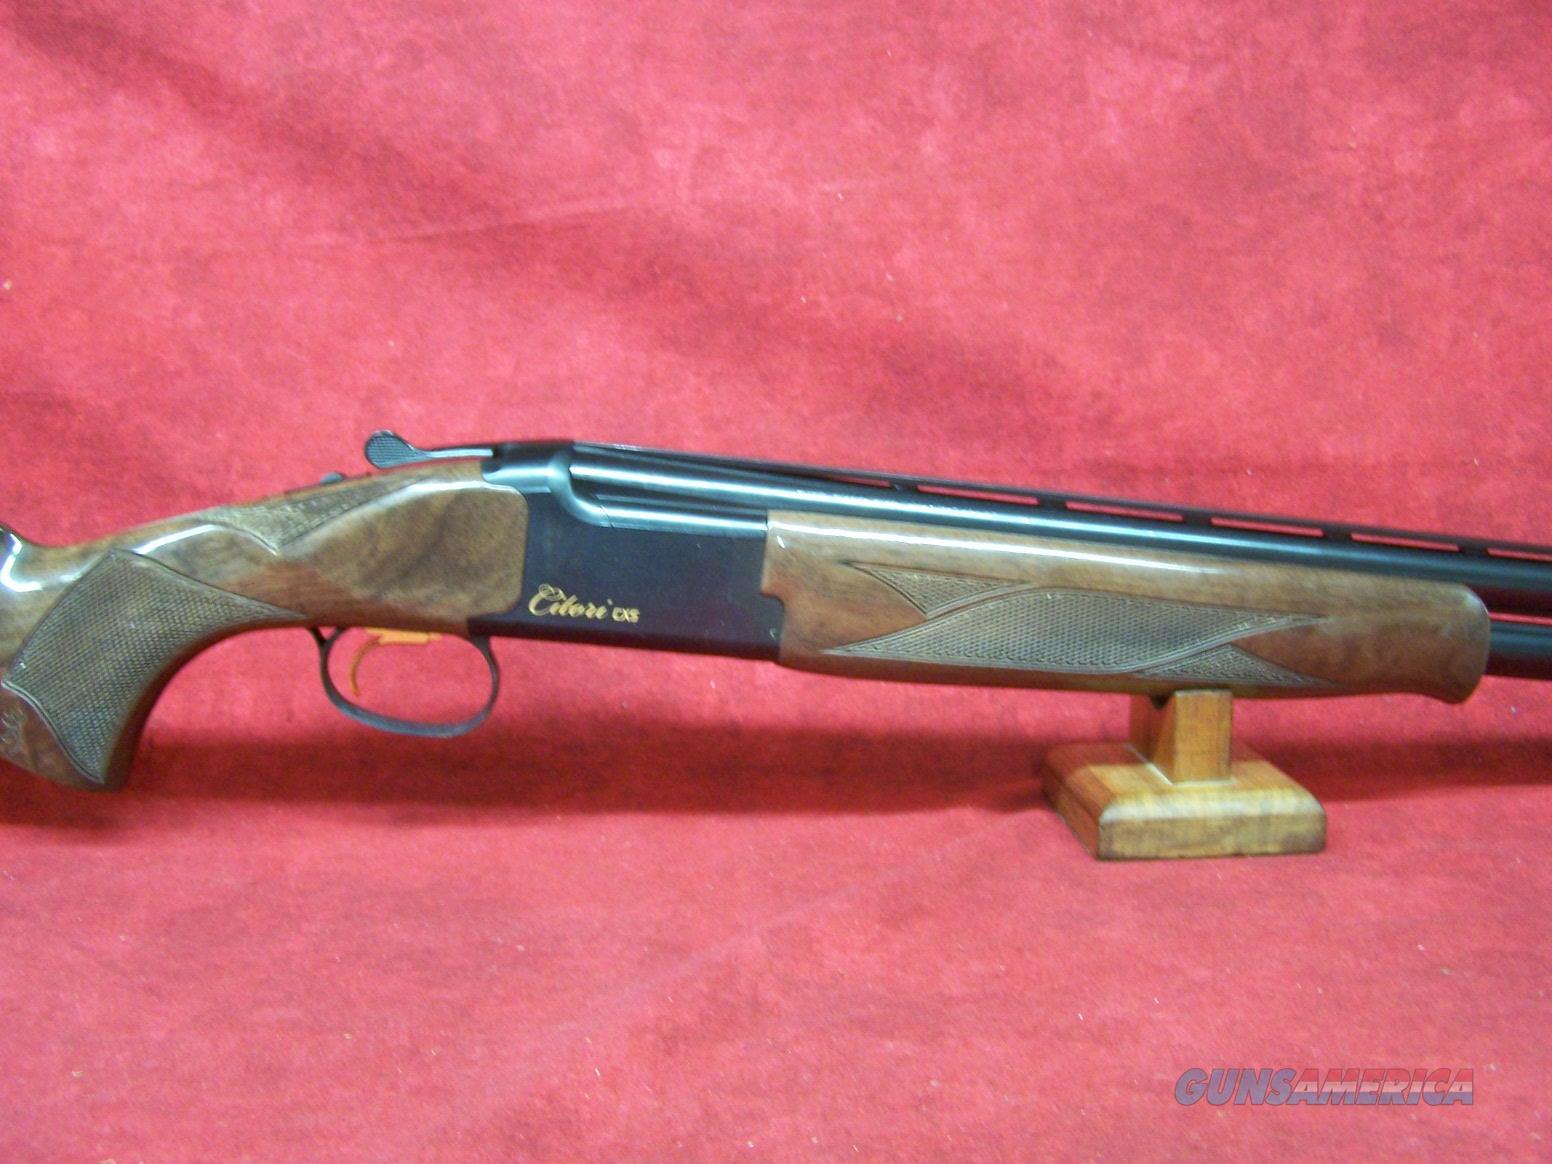 "Browning Citori CXS Adjustable 12ga 30"" barrel  3"" (018110303)  Guns > Shotguns > Browning Shotguns > Over Unders > Citori > Trap/Skeet"